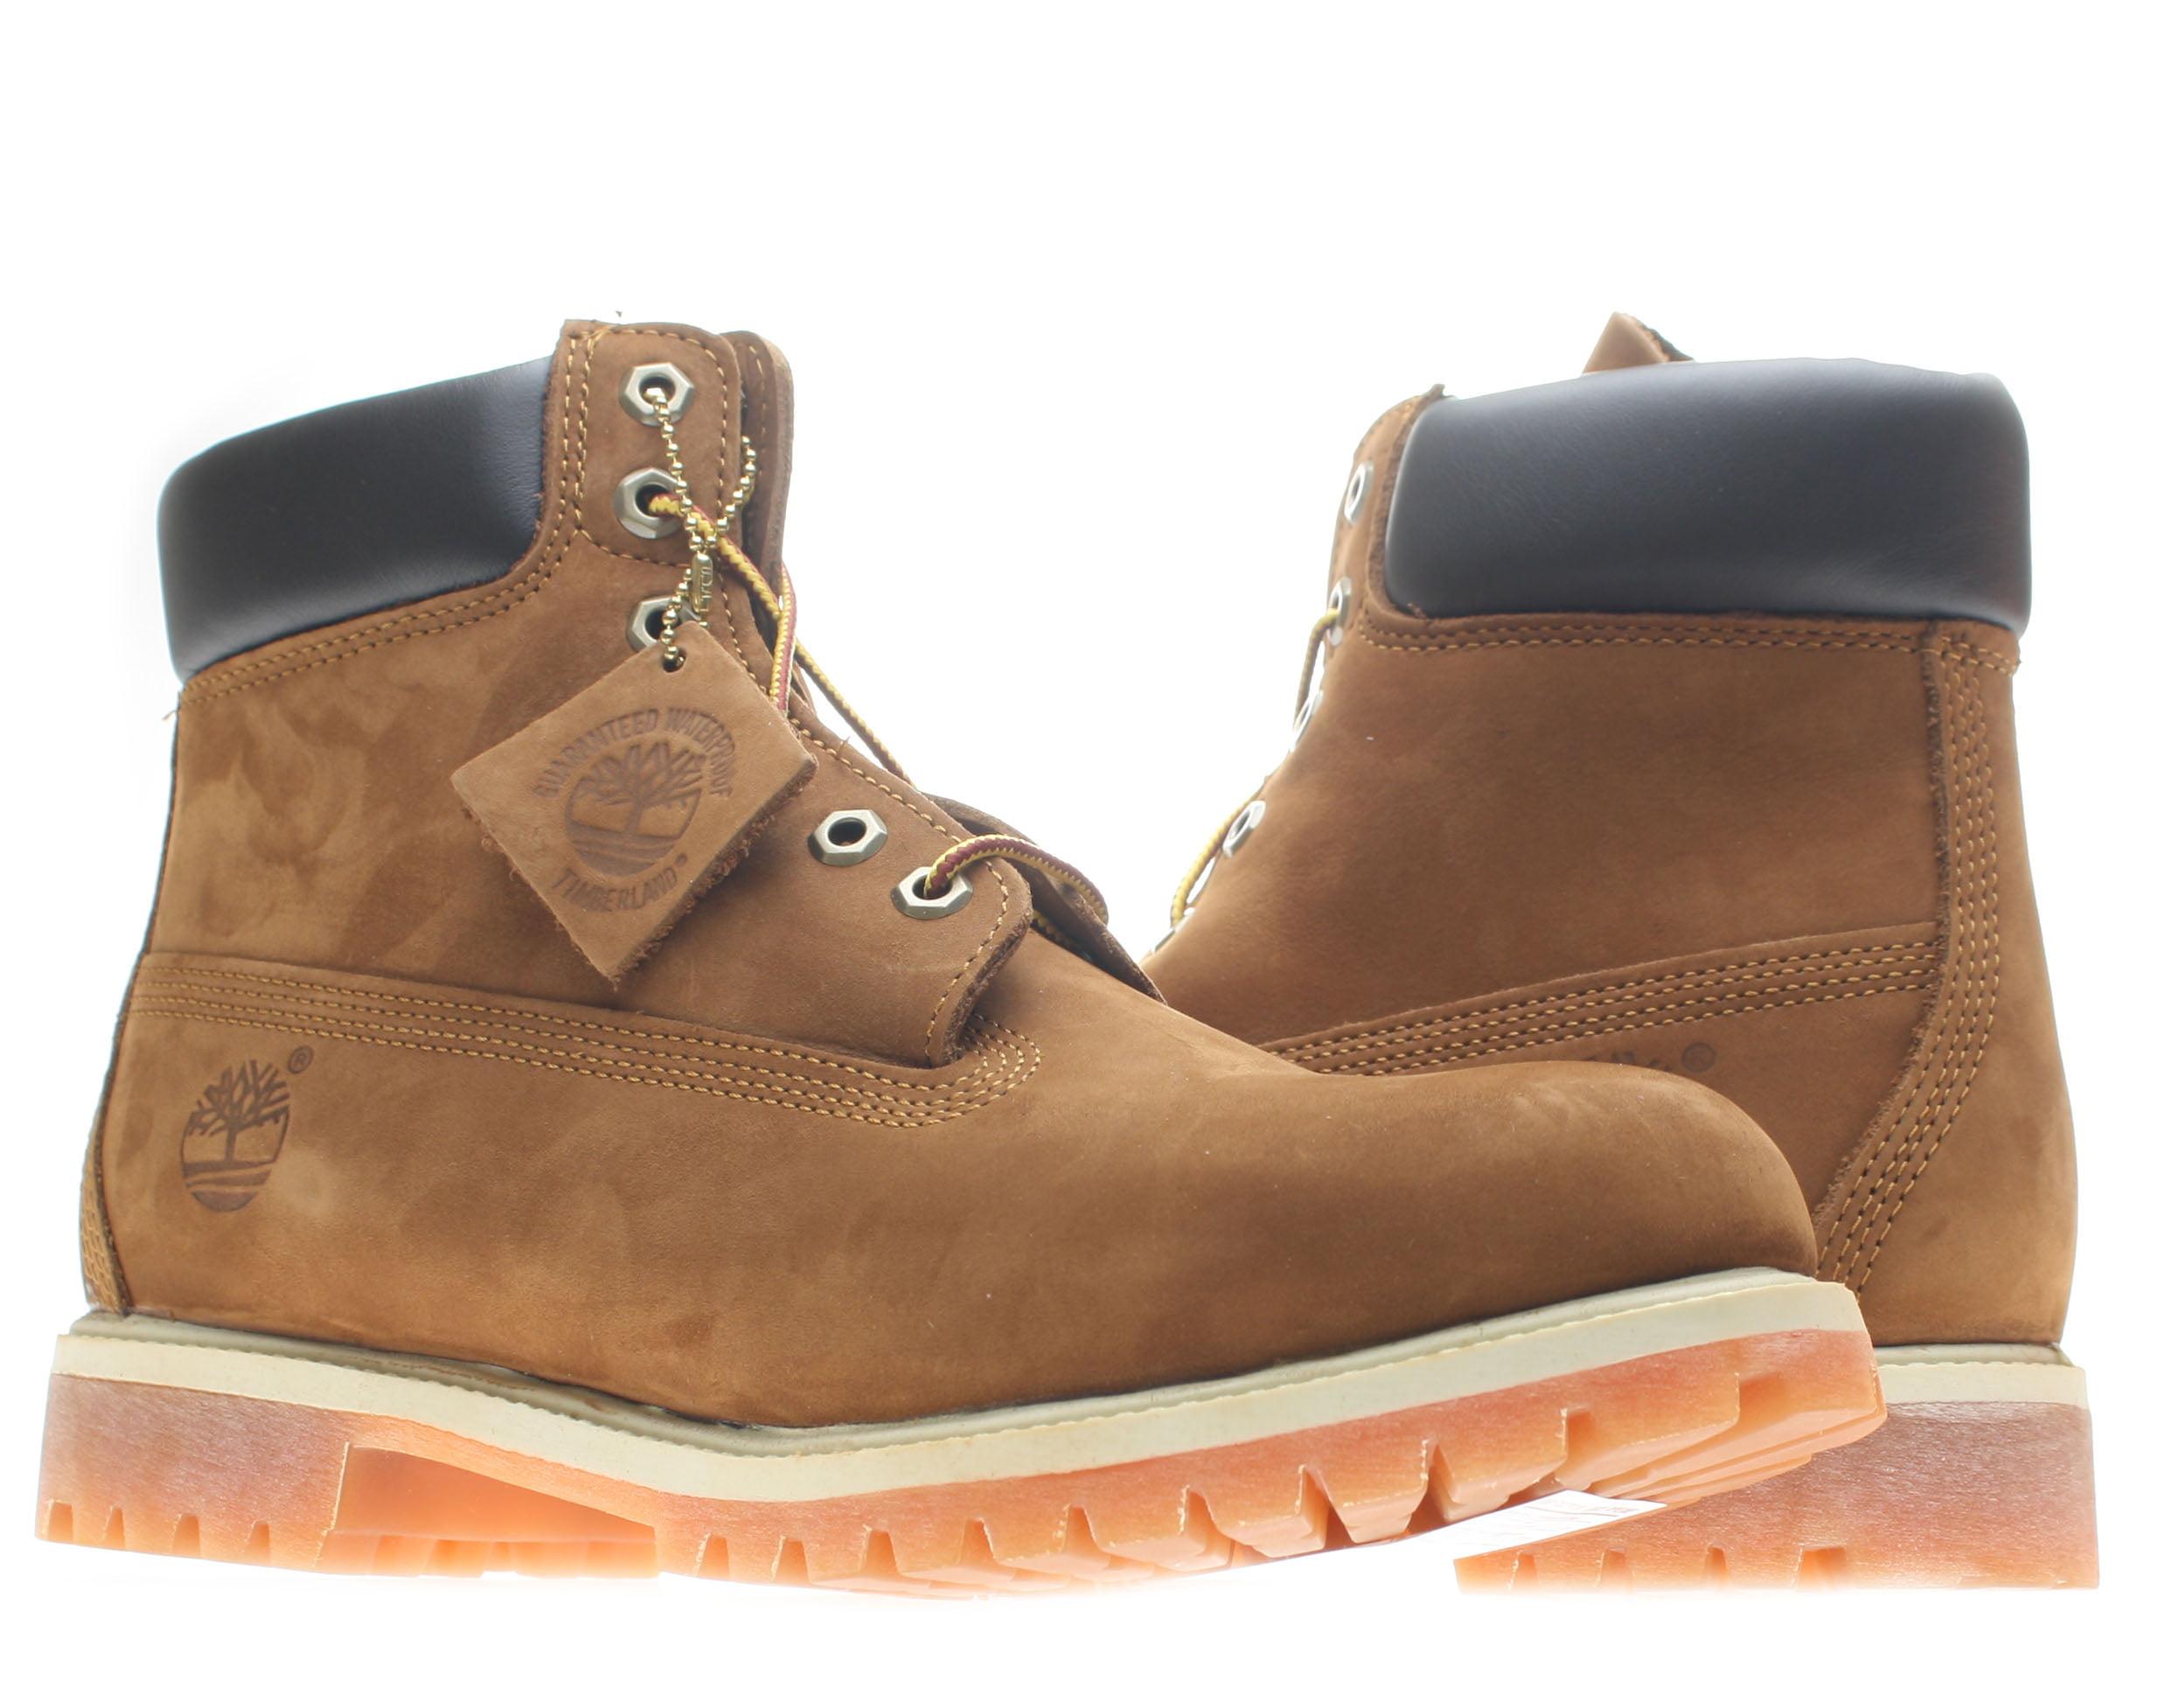 Timberland 6-Inch Premium Waterproof Men's Rust Nubuck Boots 72066 Size 7.5 by Timberland